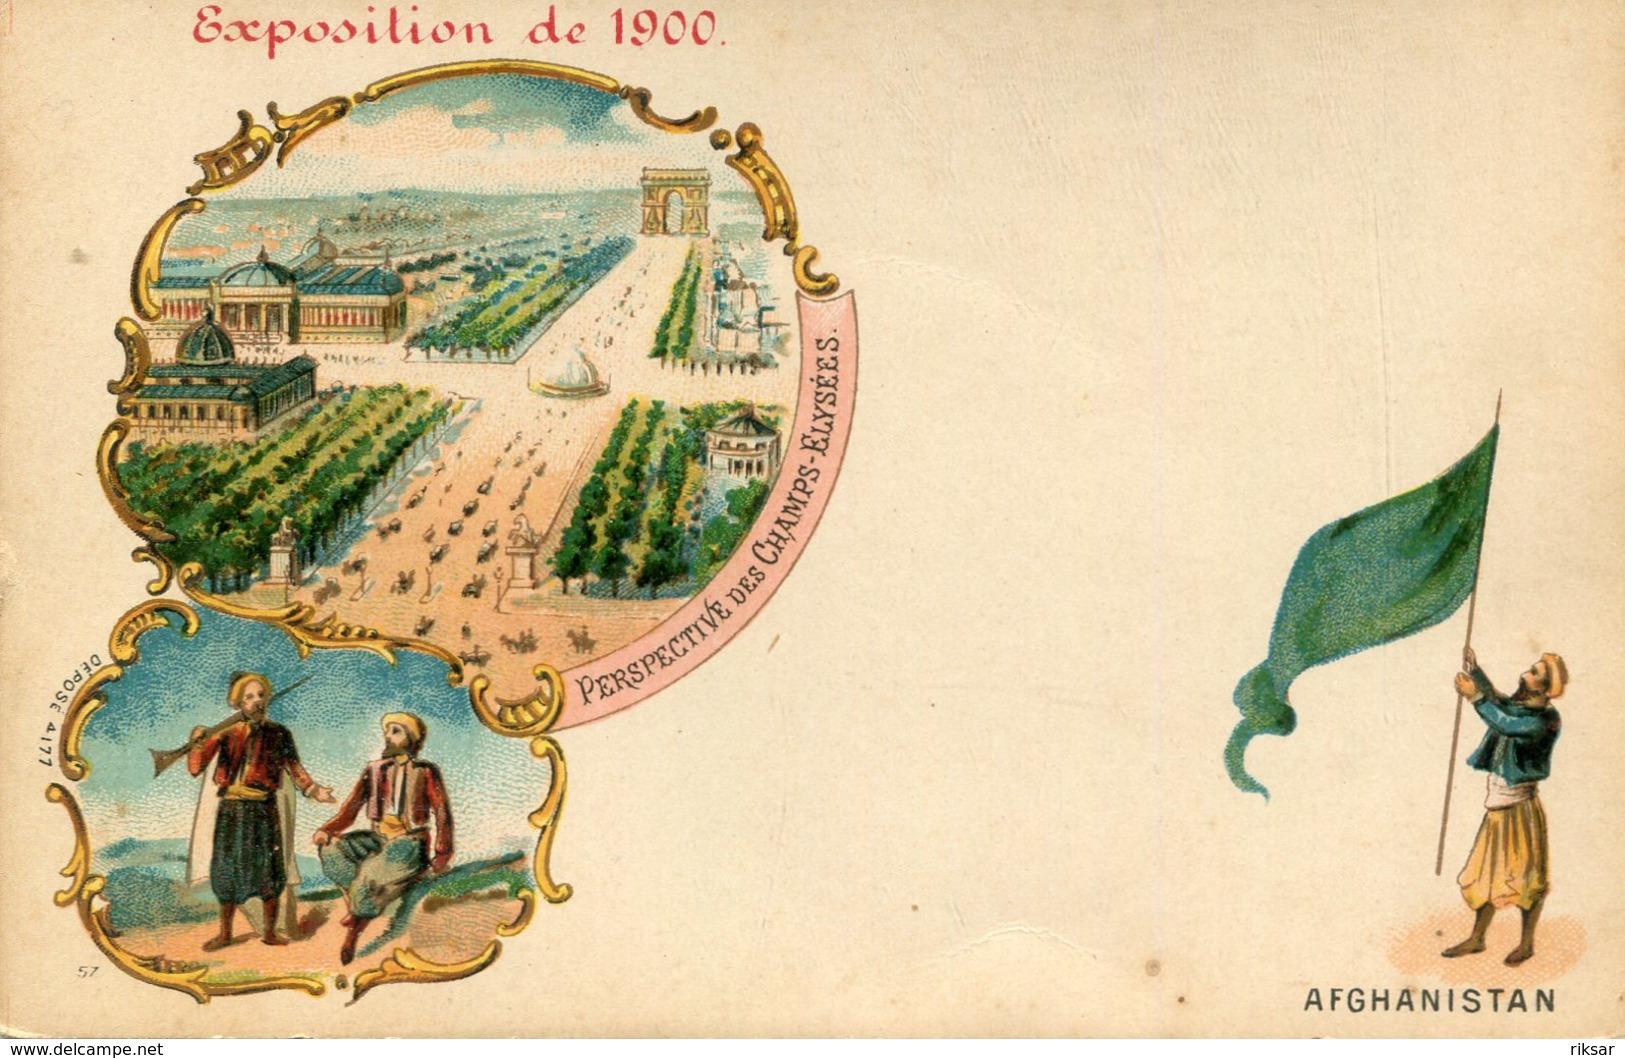 AFGHANISTAN(EXPOSITION PARIS 1900) - Afghanistan